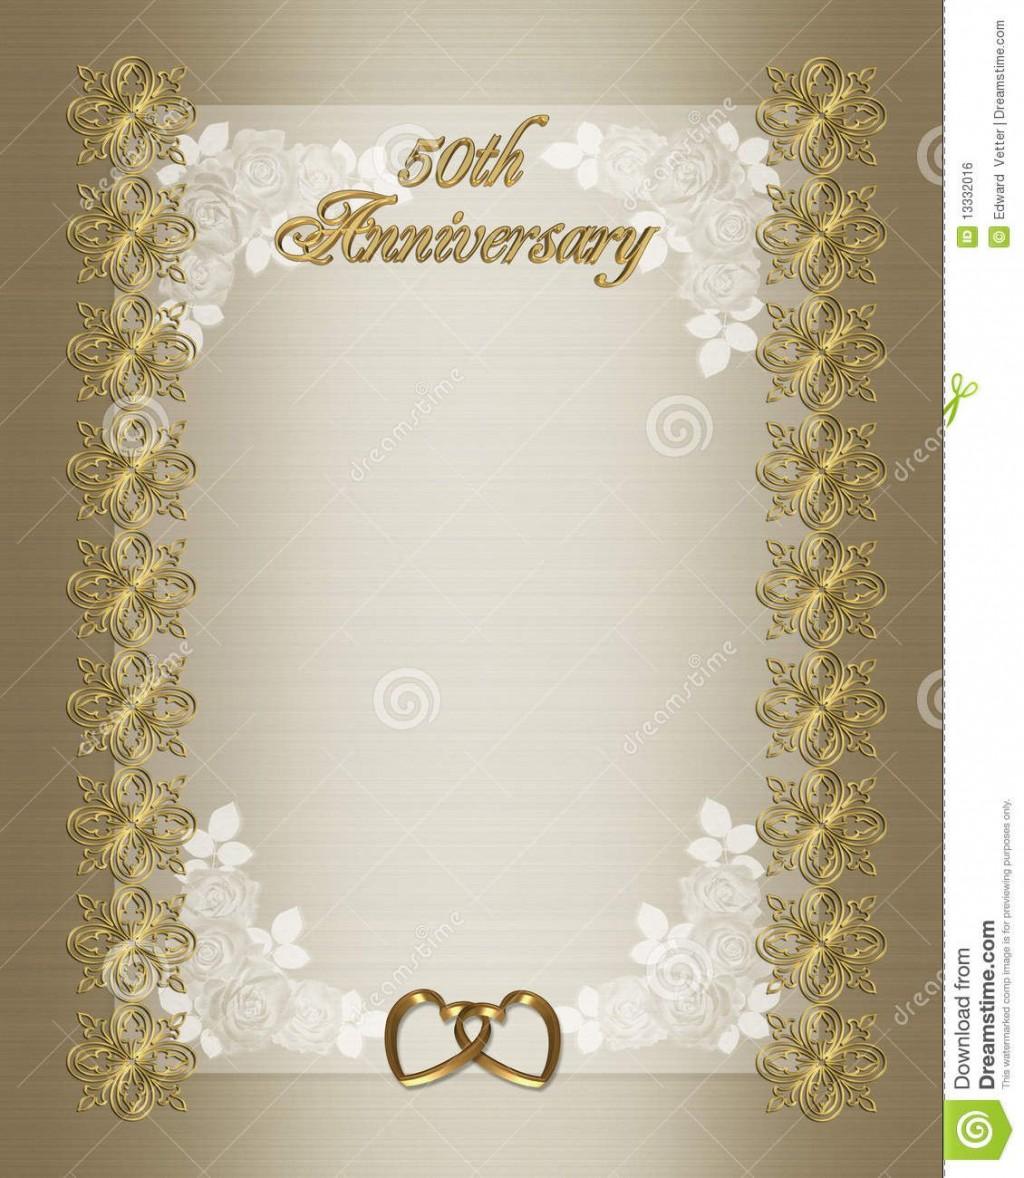 006 Wondrou Free Printable 50th Wedding Anniversary Invitation Template Design Large